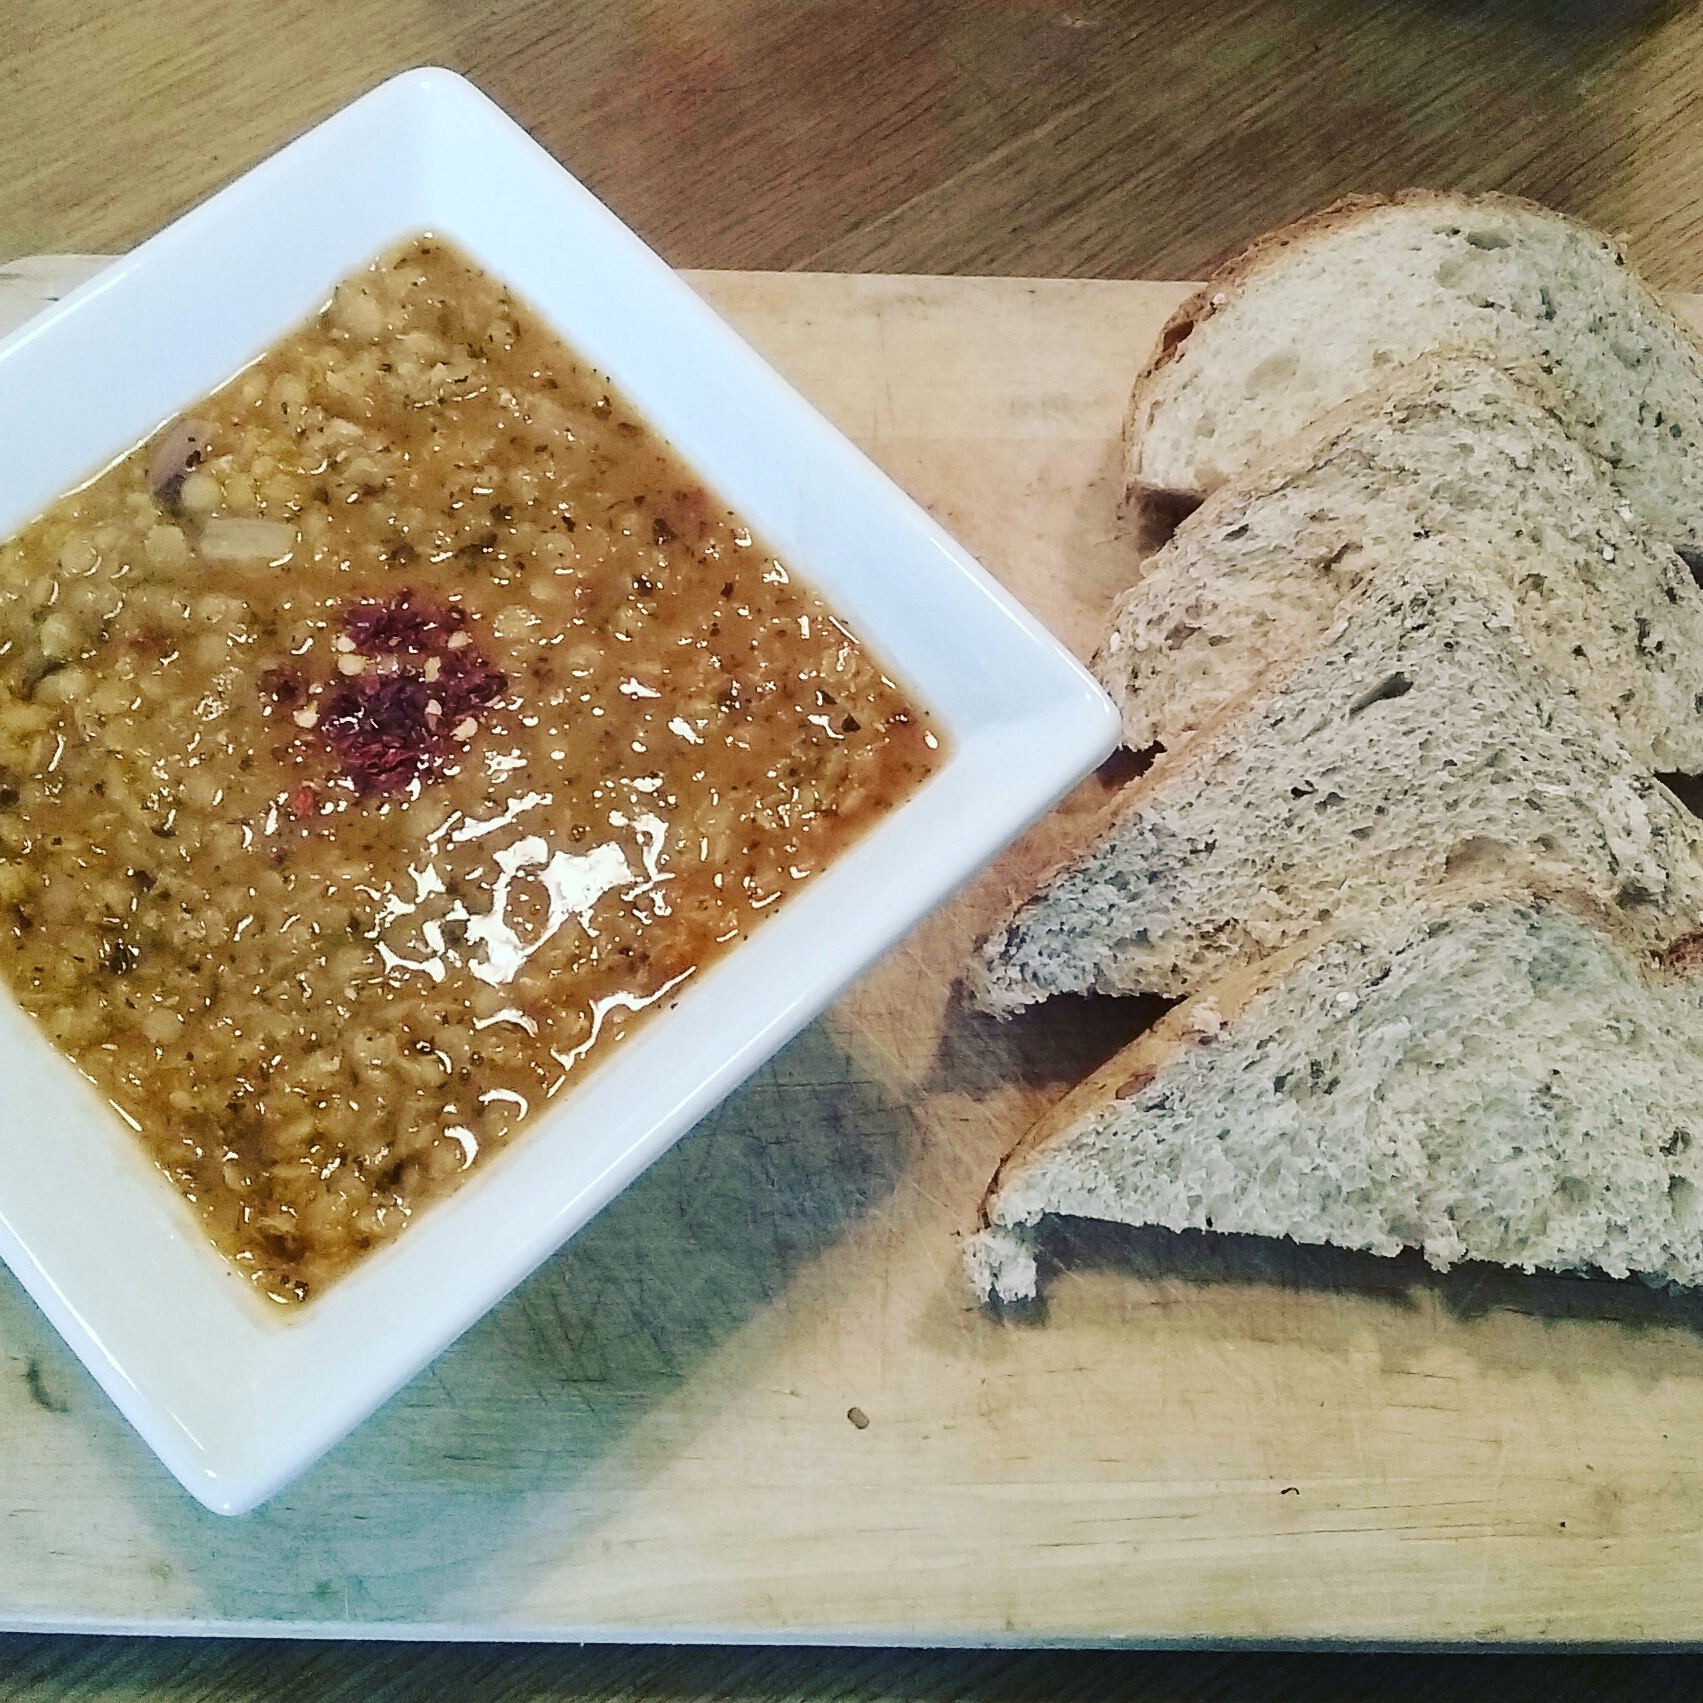 mercimet corba in a bowl alongside triangular cut bread on a chopping board